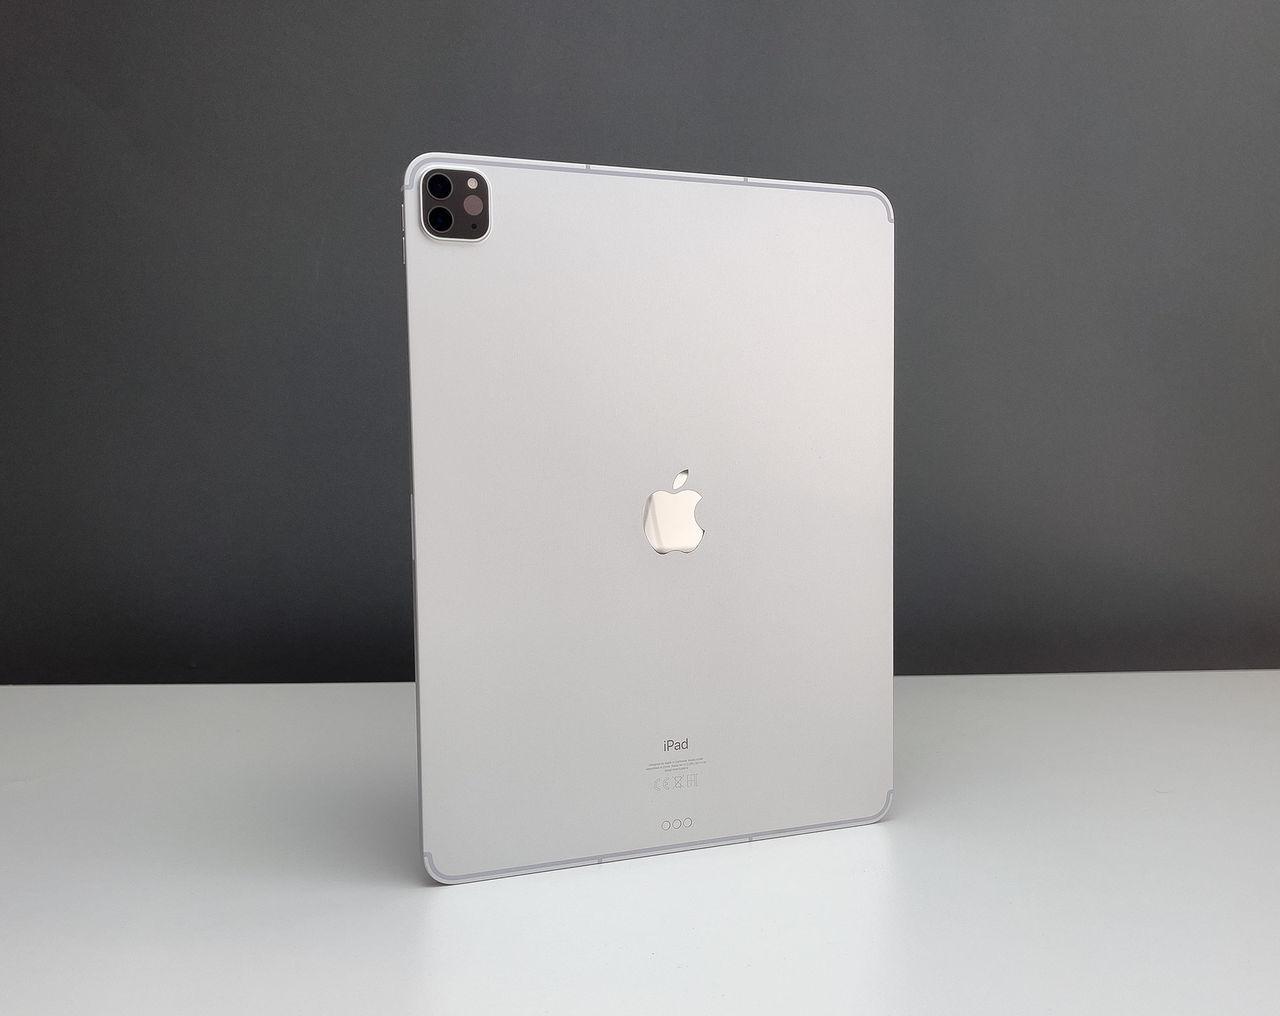 iPad Pro ryktas få trådlös laddning